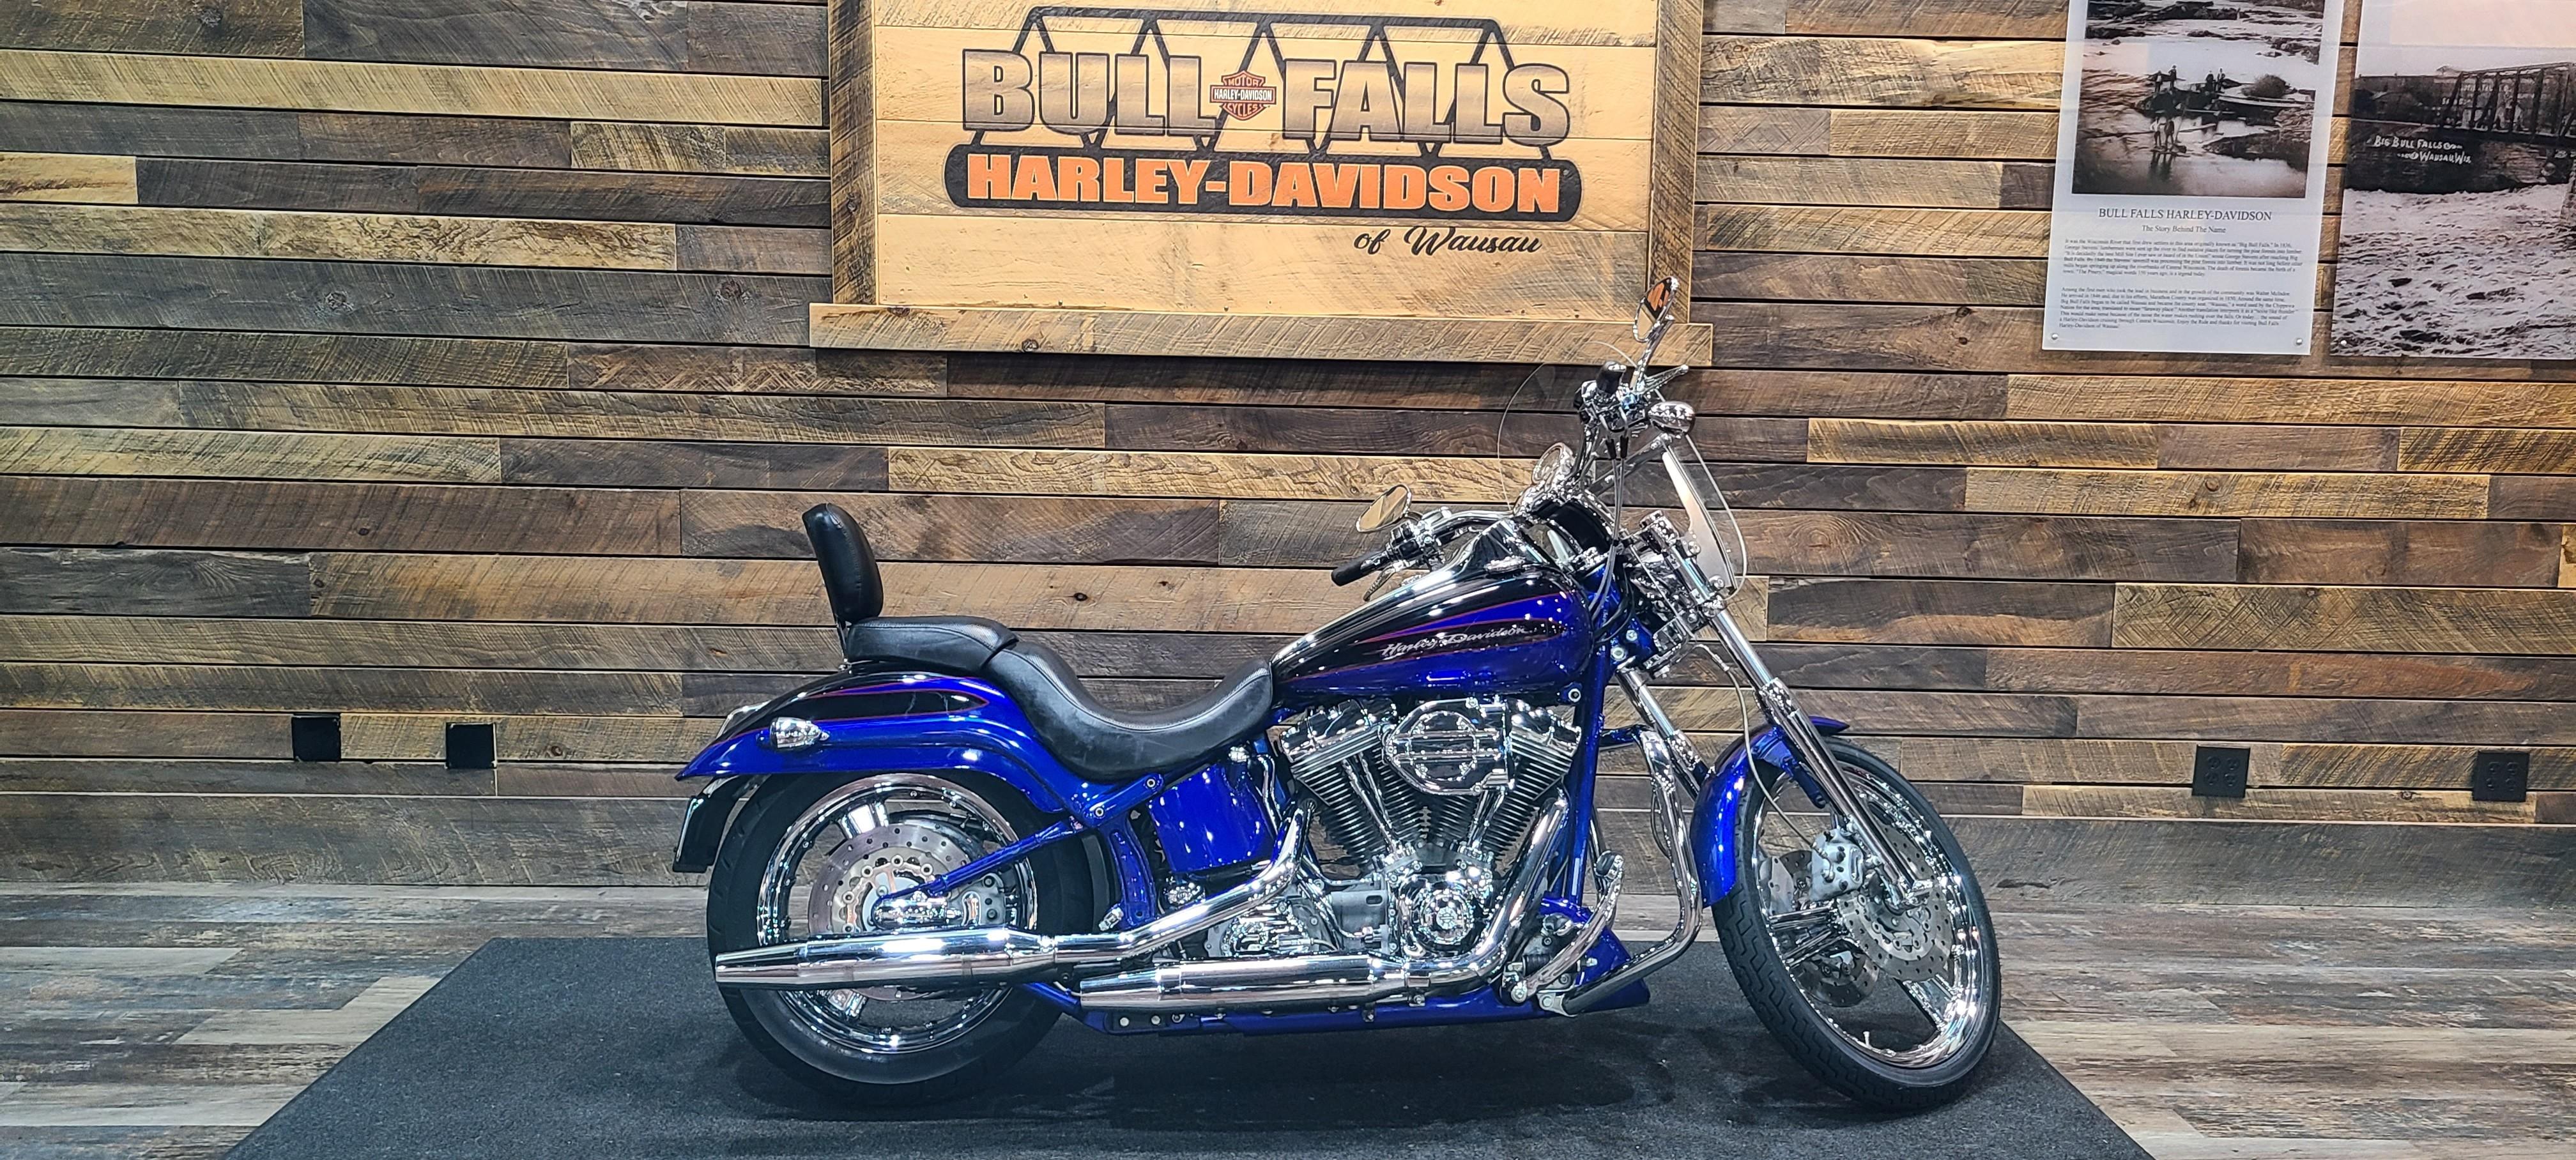 2004 Harley-Davidson FXSTDSE at Bull Falls Harley-Davidson